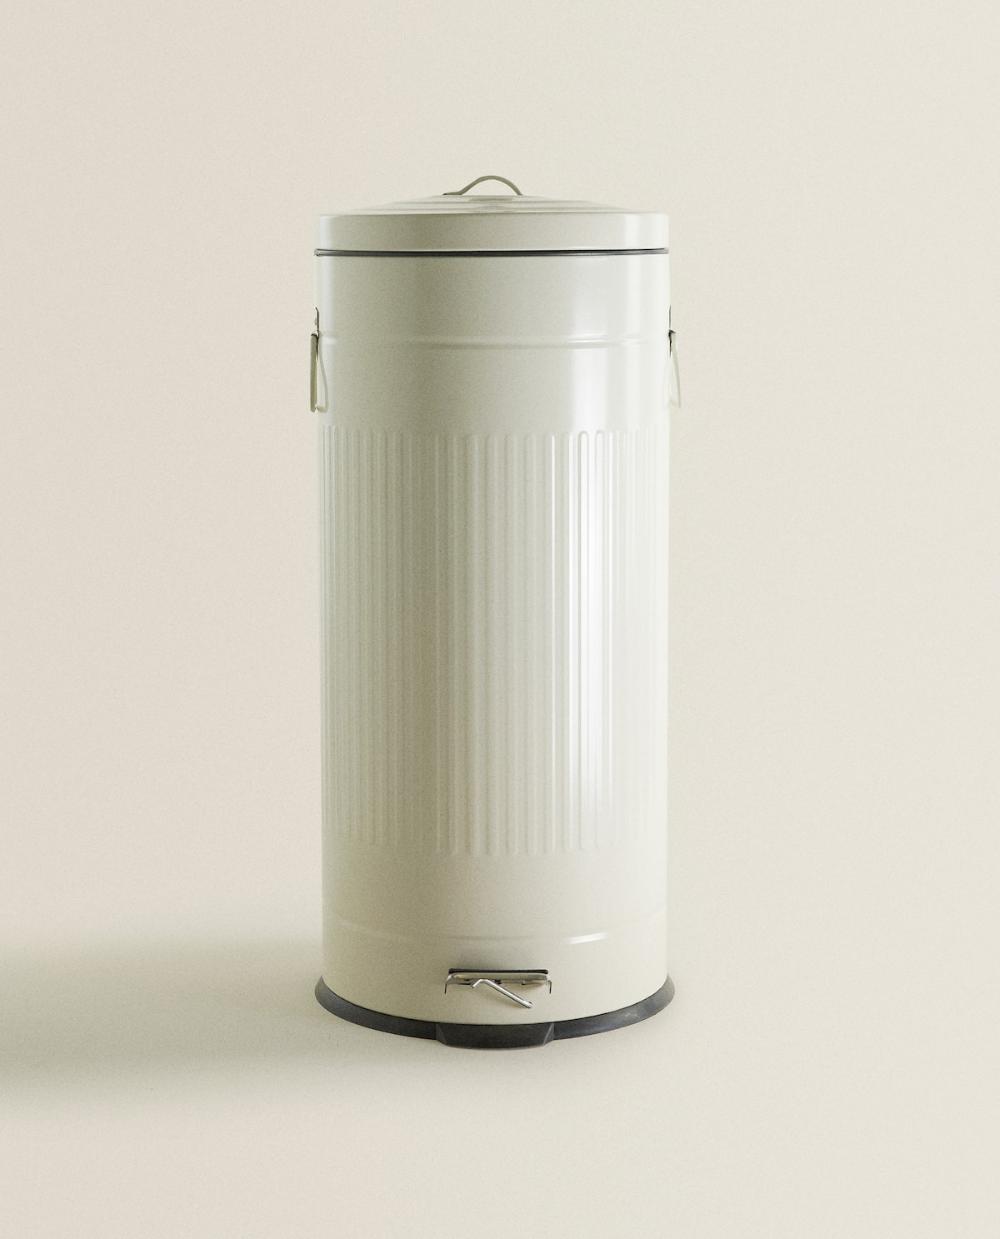 Download Wallpaper White Enamel Kitchen Garbage Can